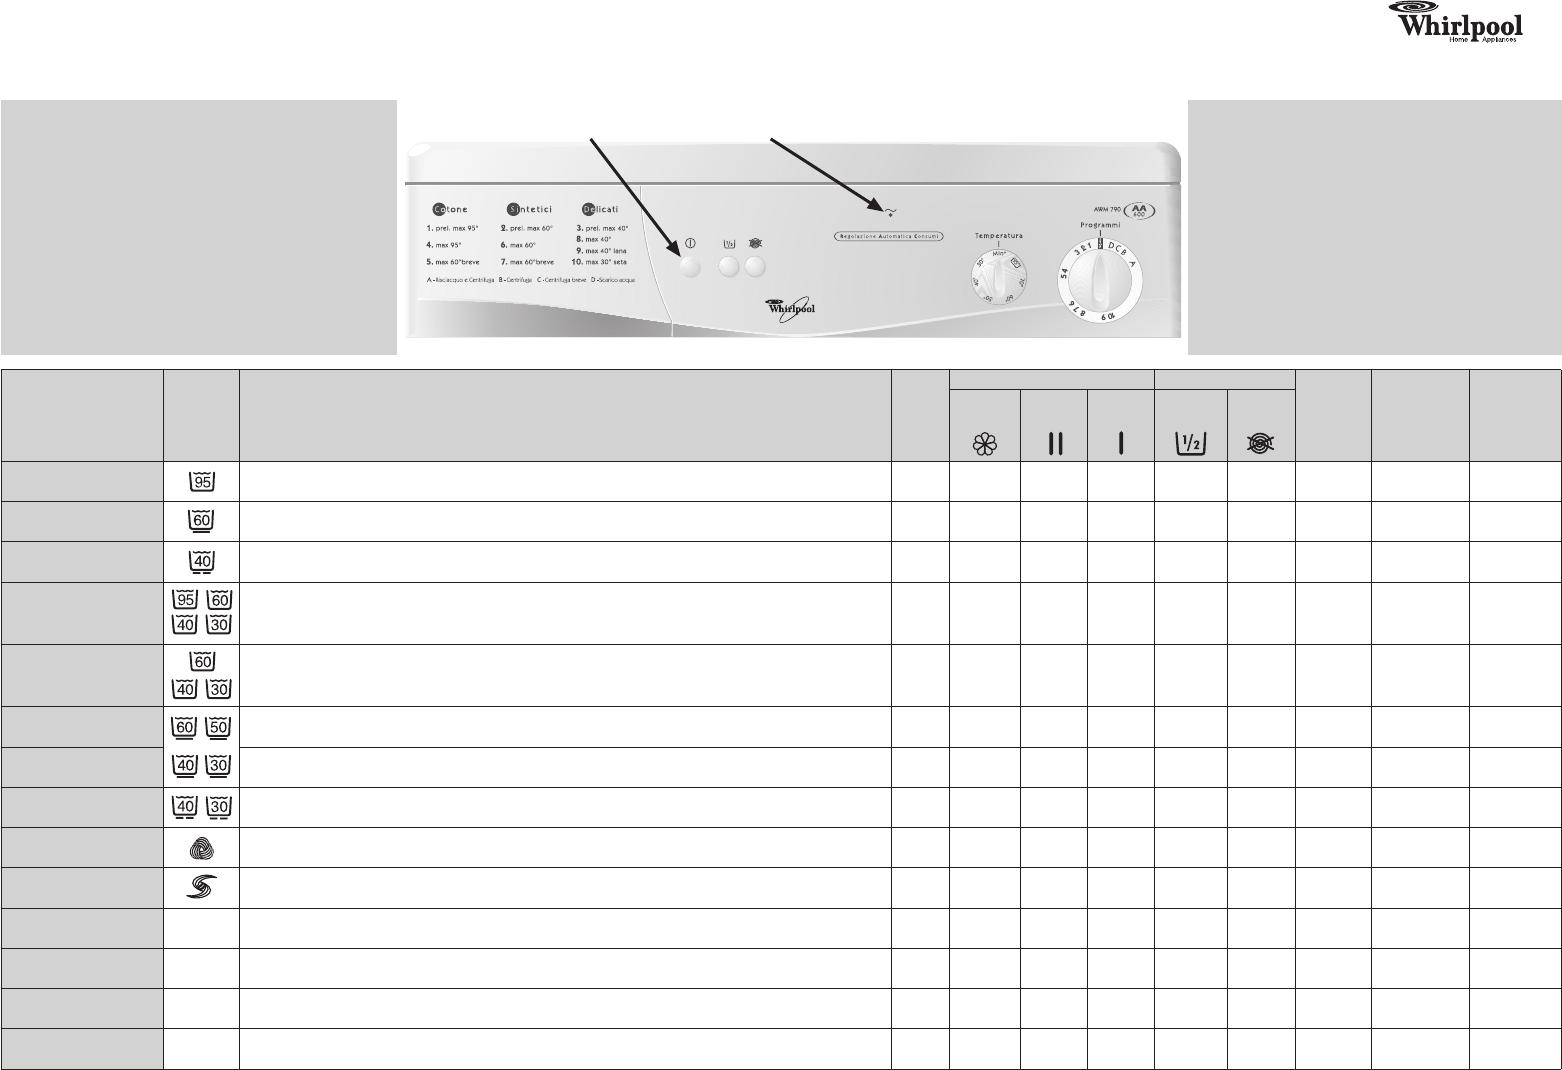 Whirlpool Woolmark Manual Kubota F2880 Wiring Diagram Array Awm 790 Page 1 Of 2 English Rh Libble Eu